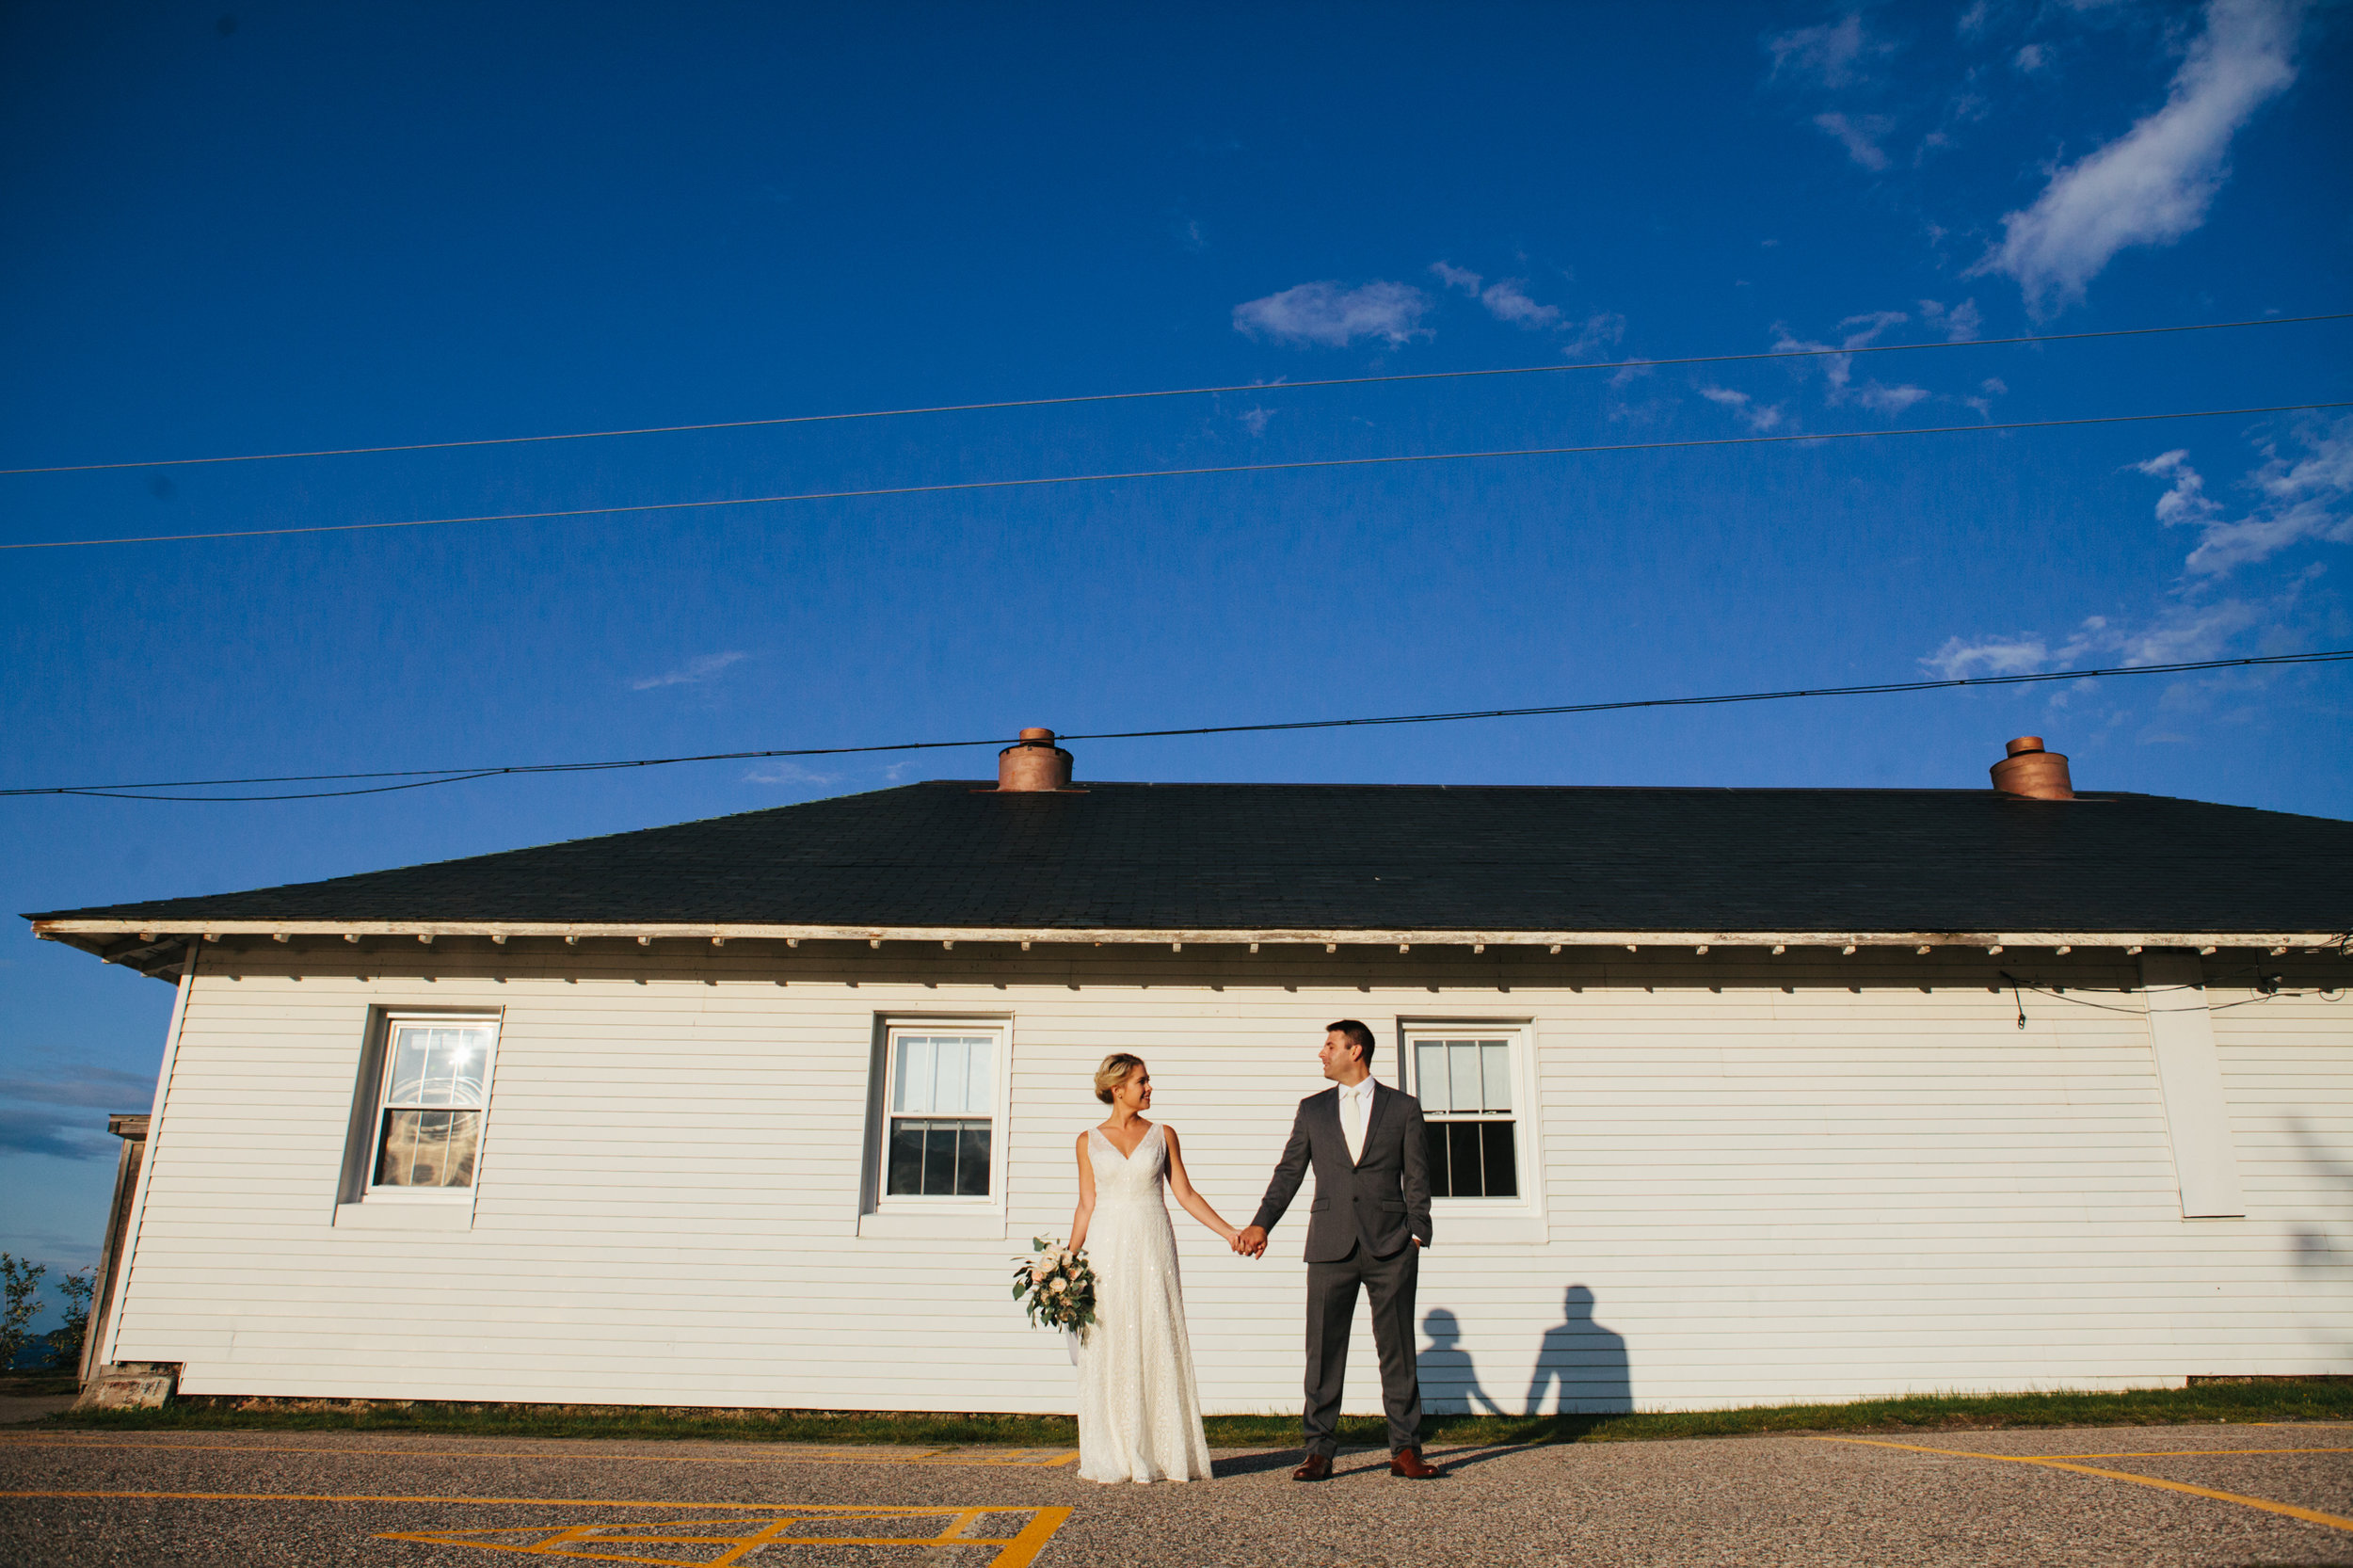 spring-point-ledge-lighthouse-wedding-south-portland-maine-3103.jpg